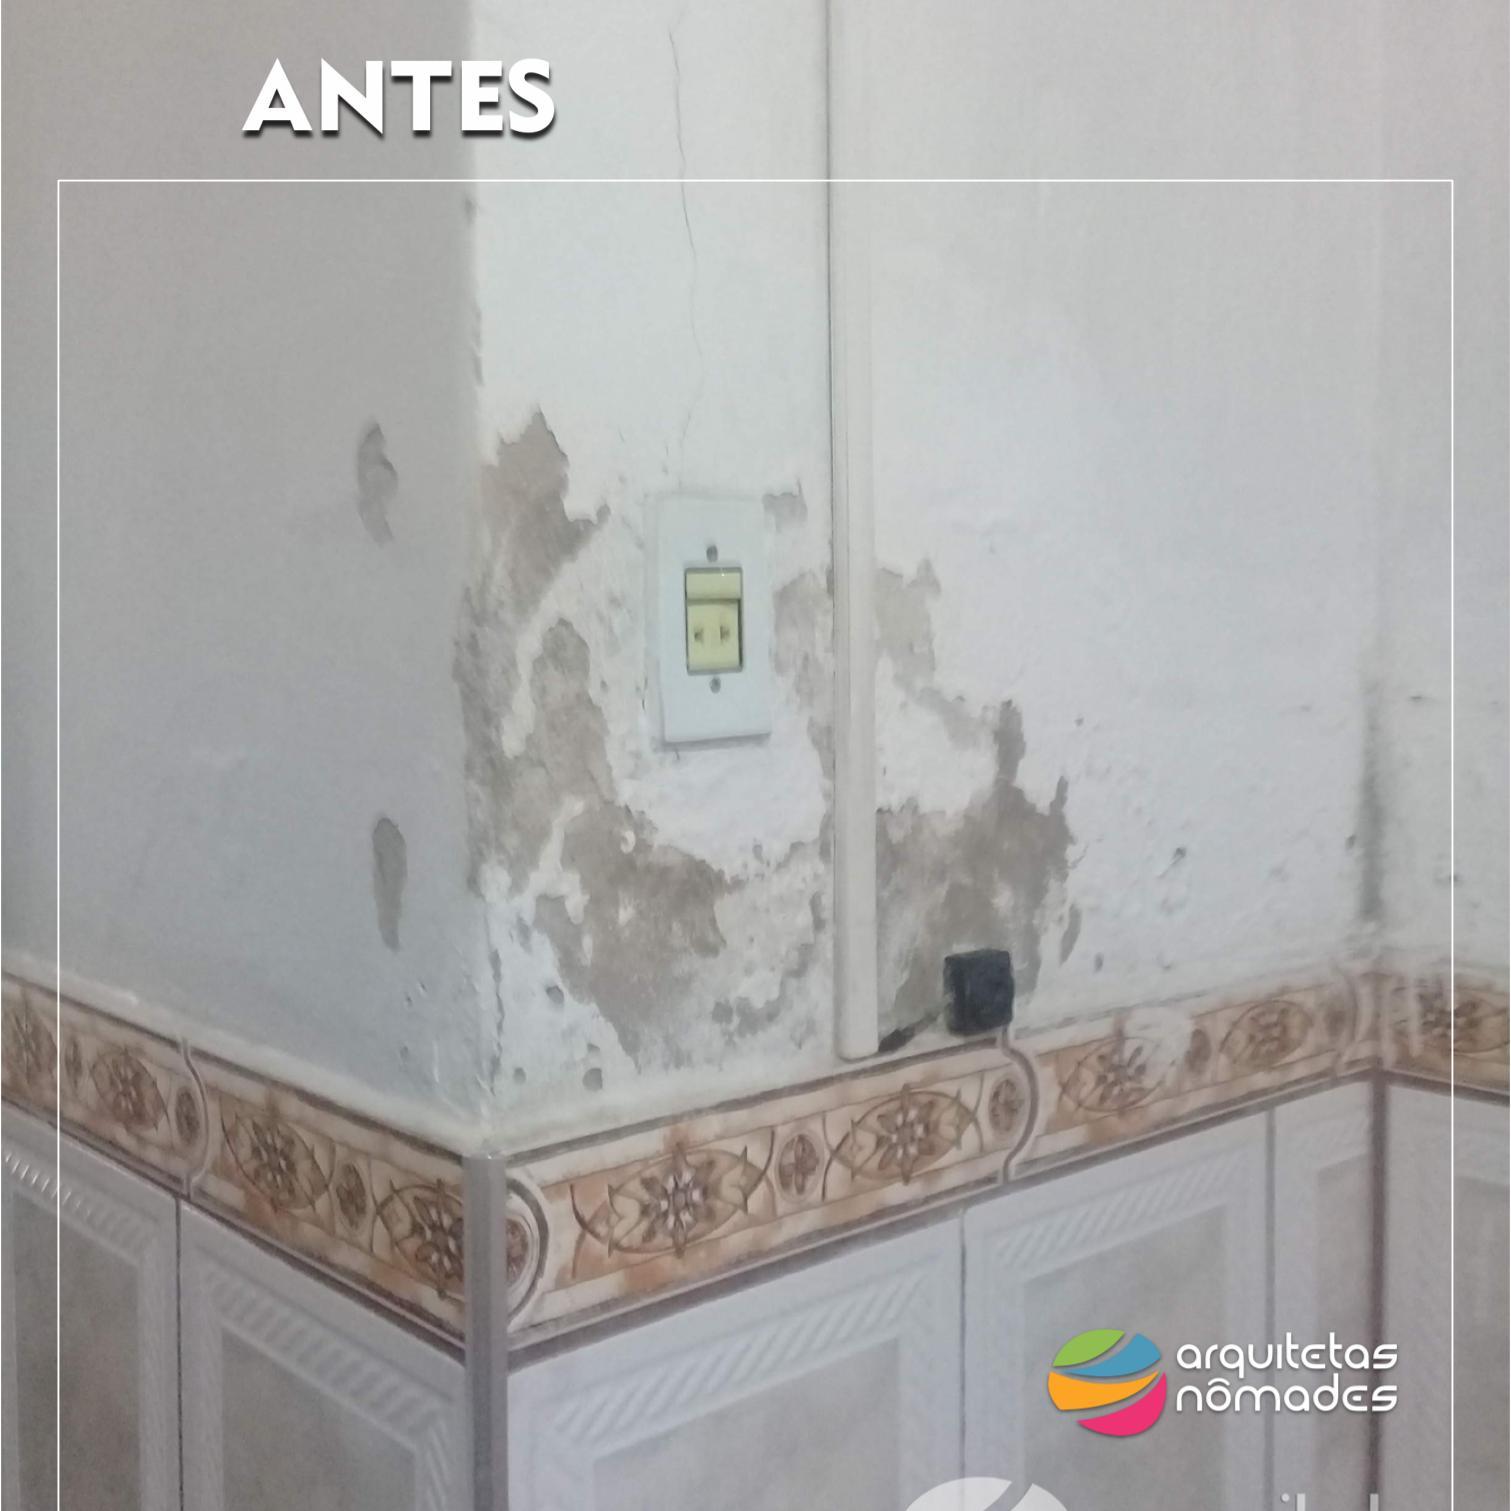 ANTES2-katia